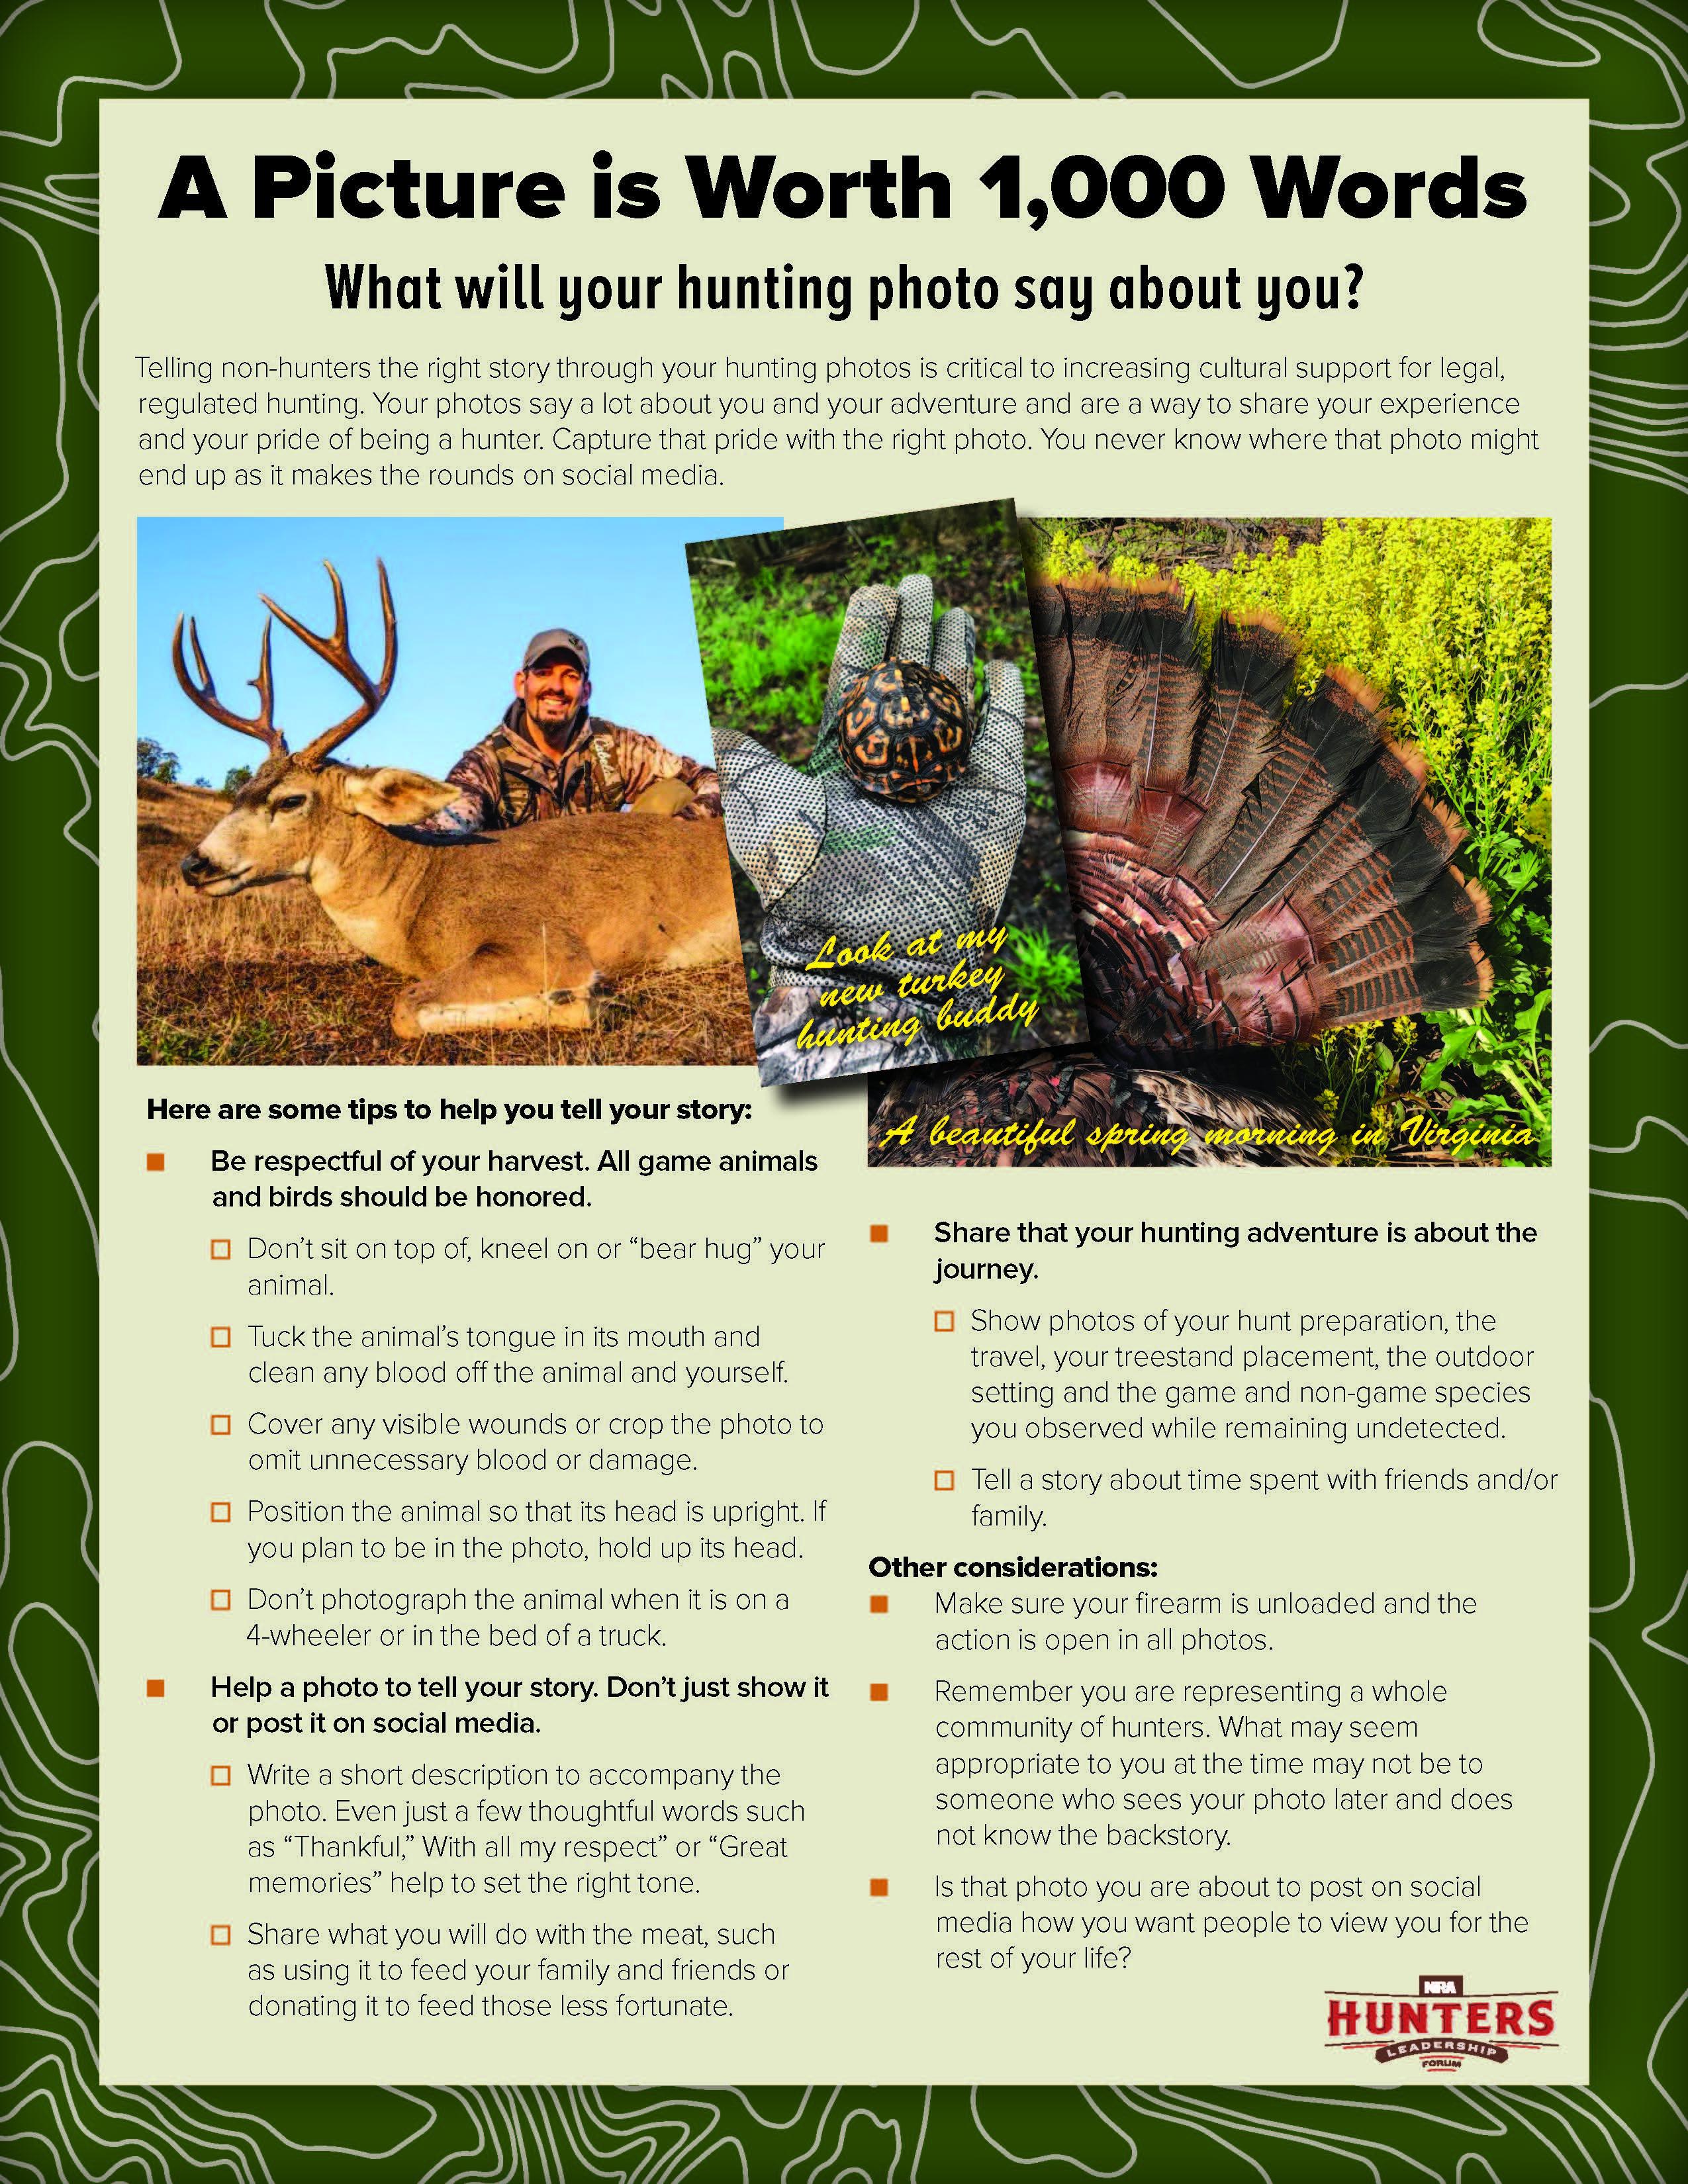 Hunting Photo Considerations